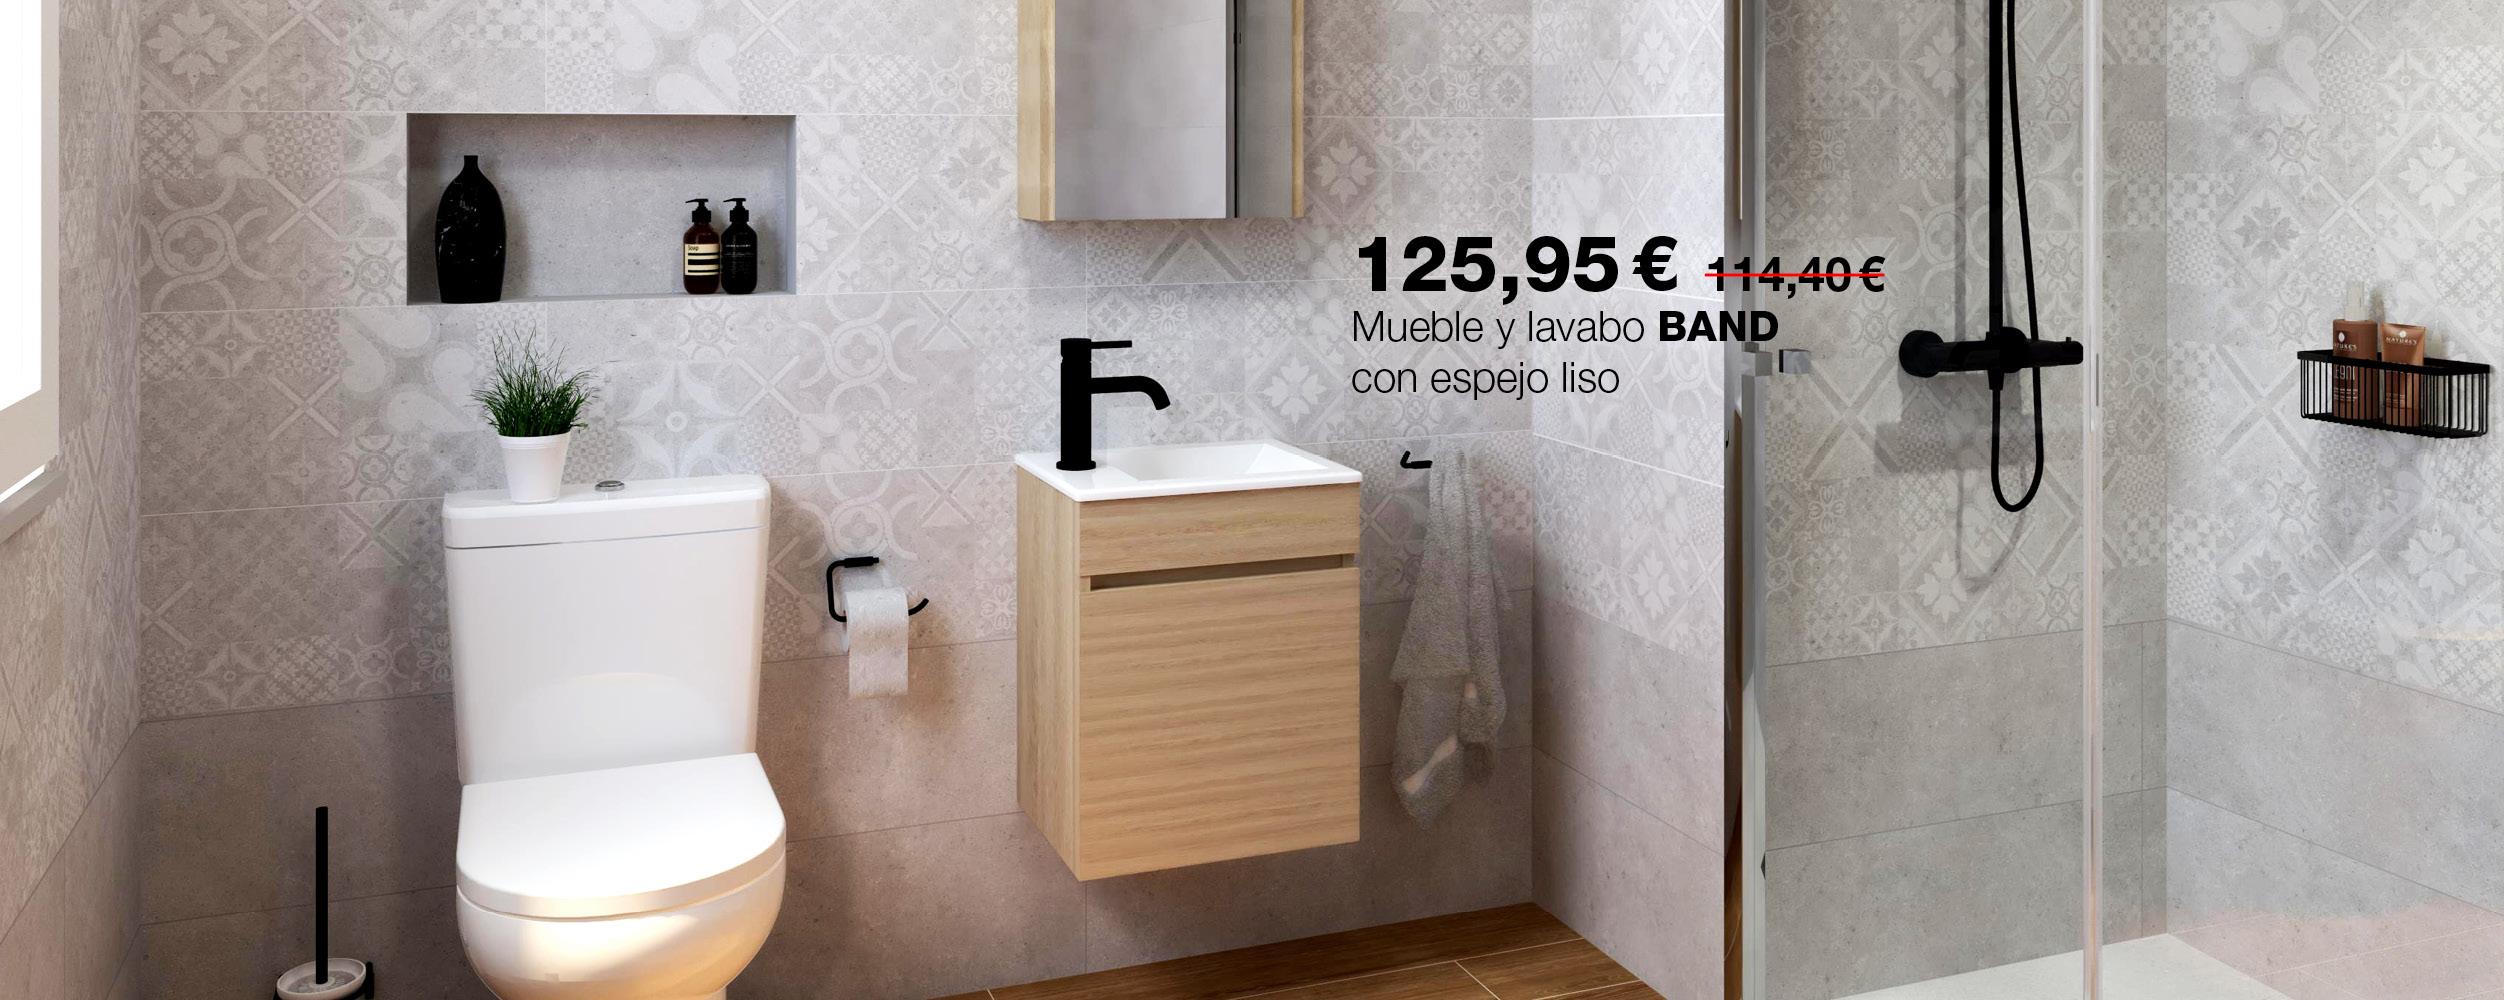 Conjunto de mueble, lavabo BAND con espejo